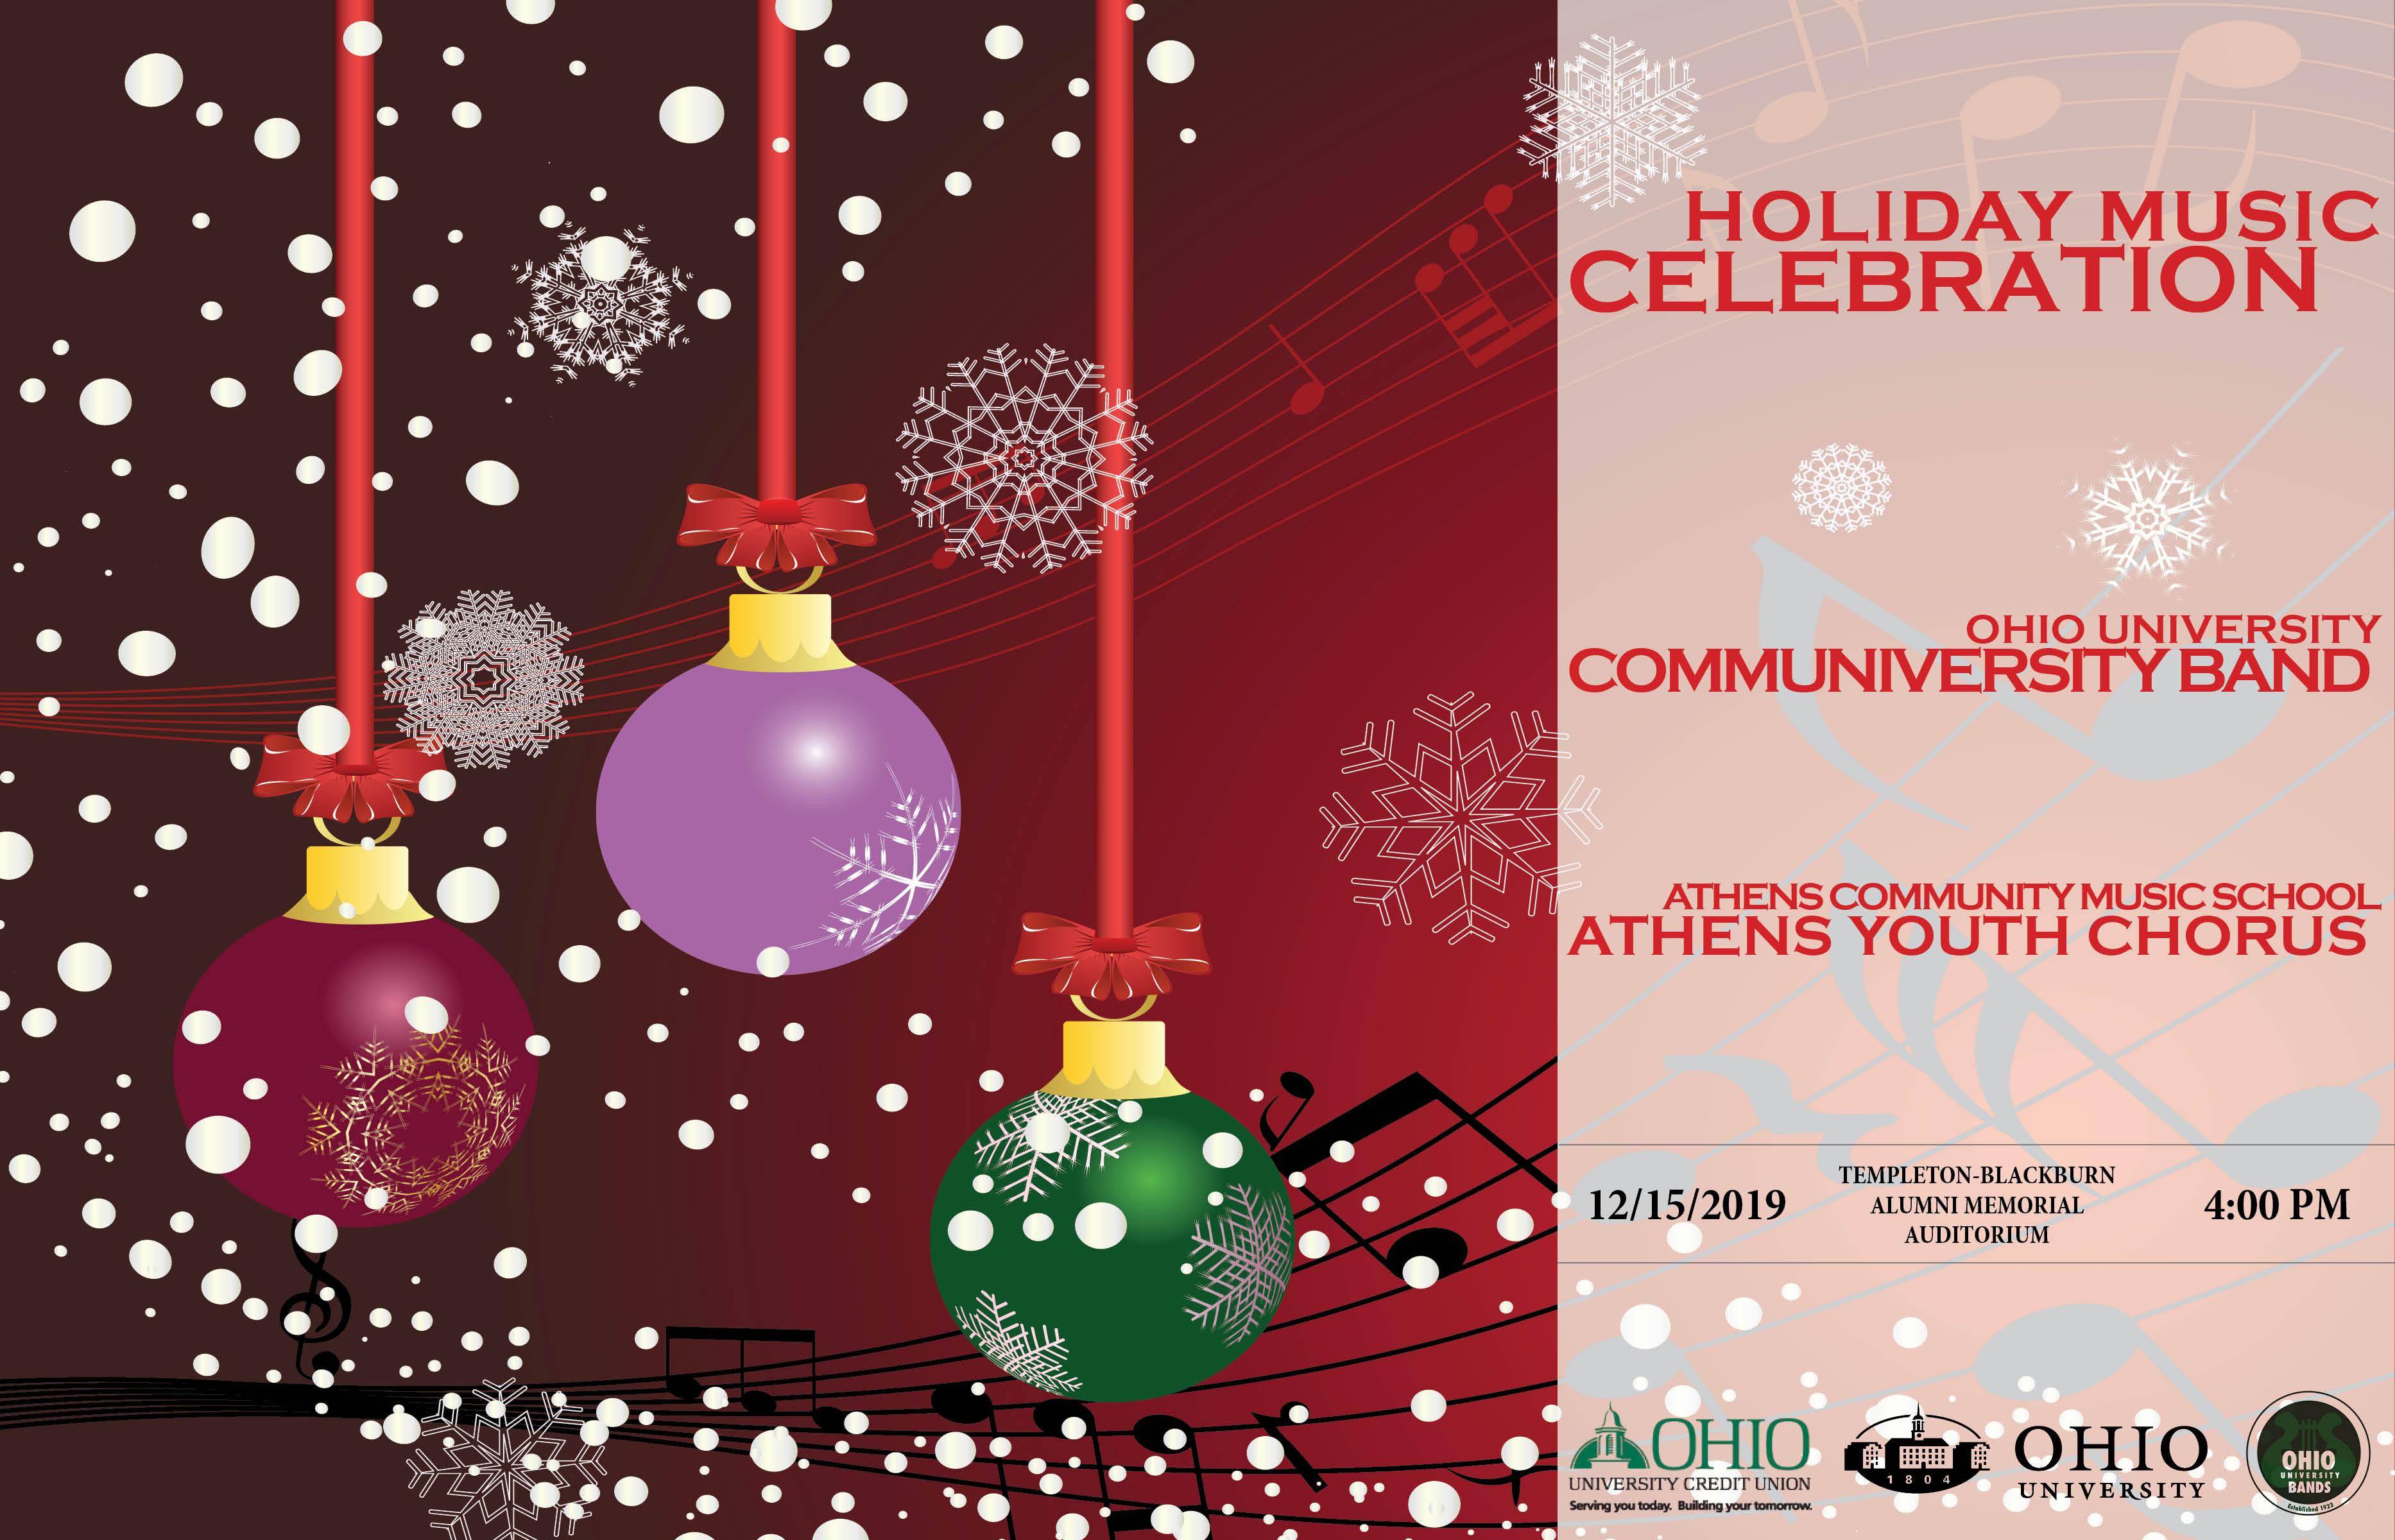 Holiday Musical Celebration flier